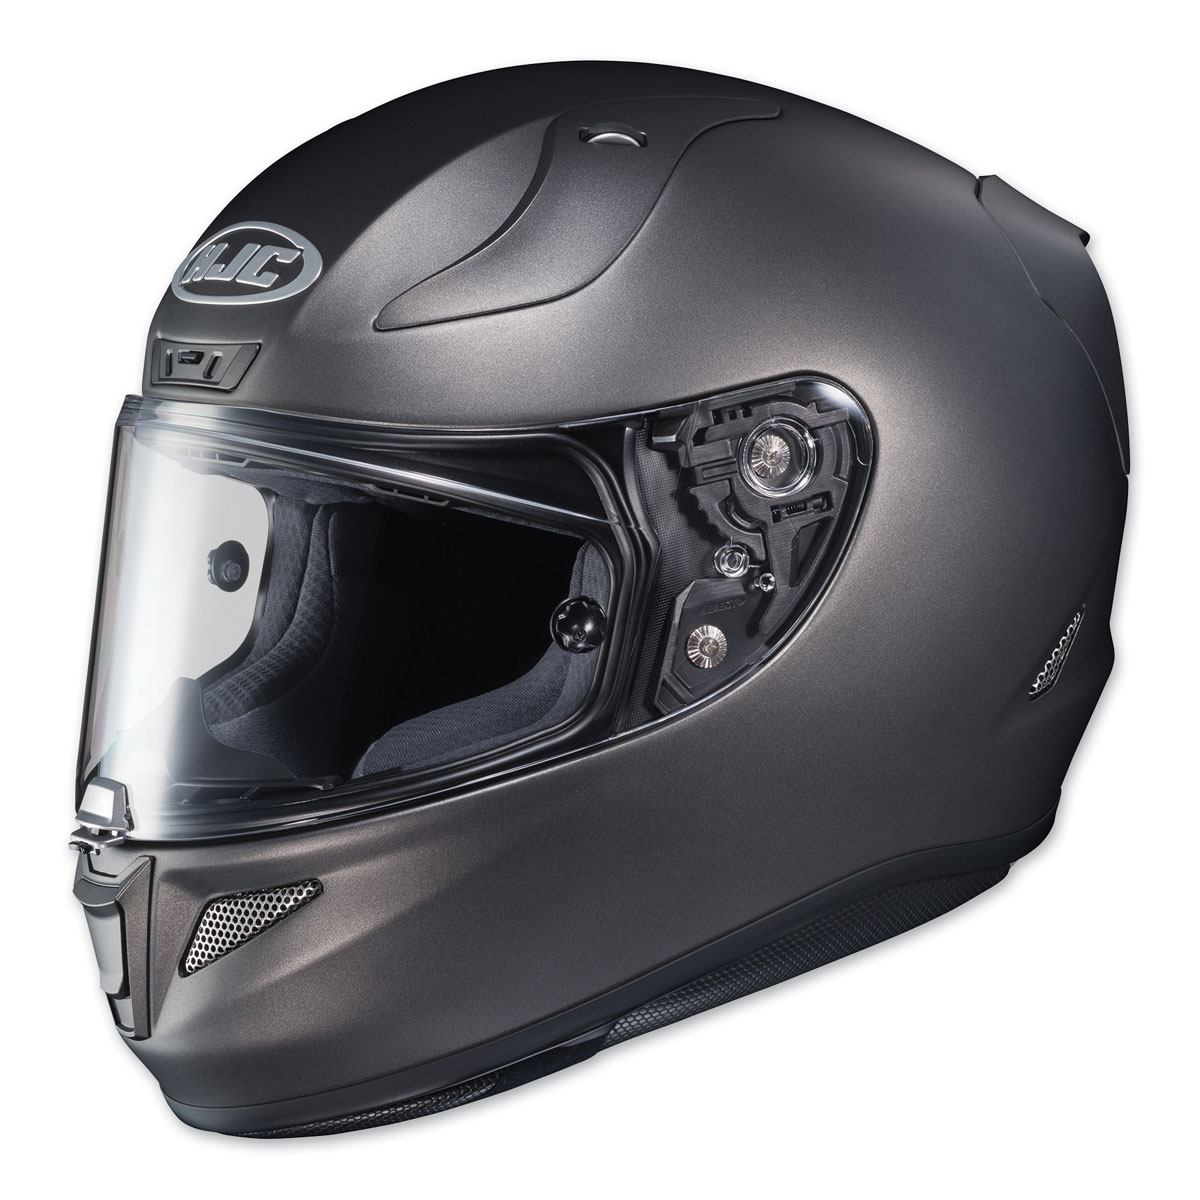 HJC RPHA 11 Pro Titanium Full Face Helmet